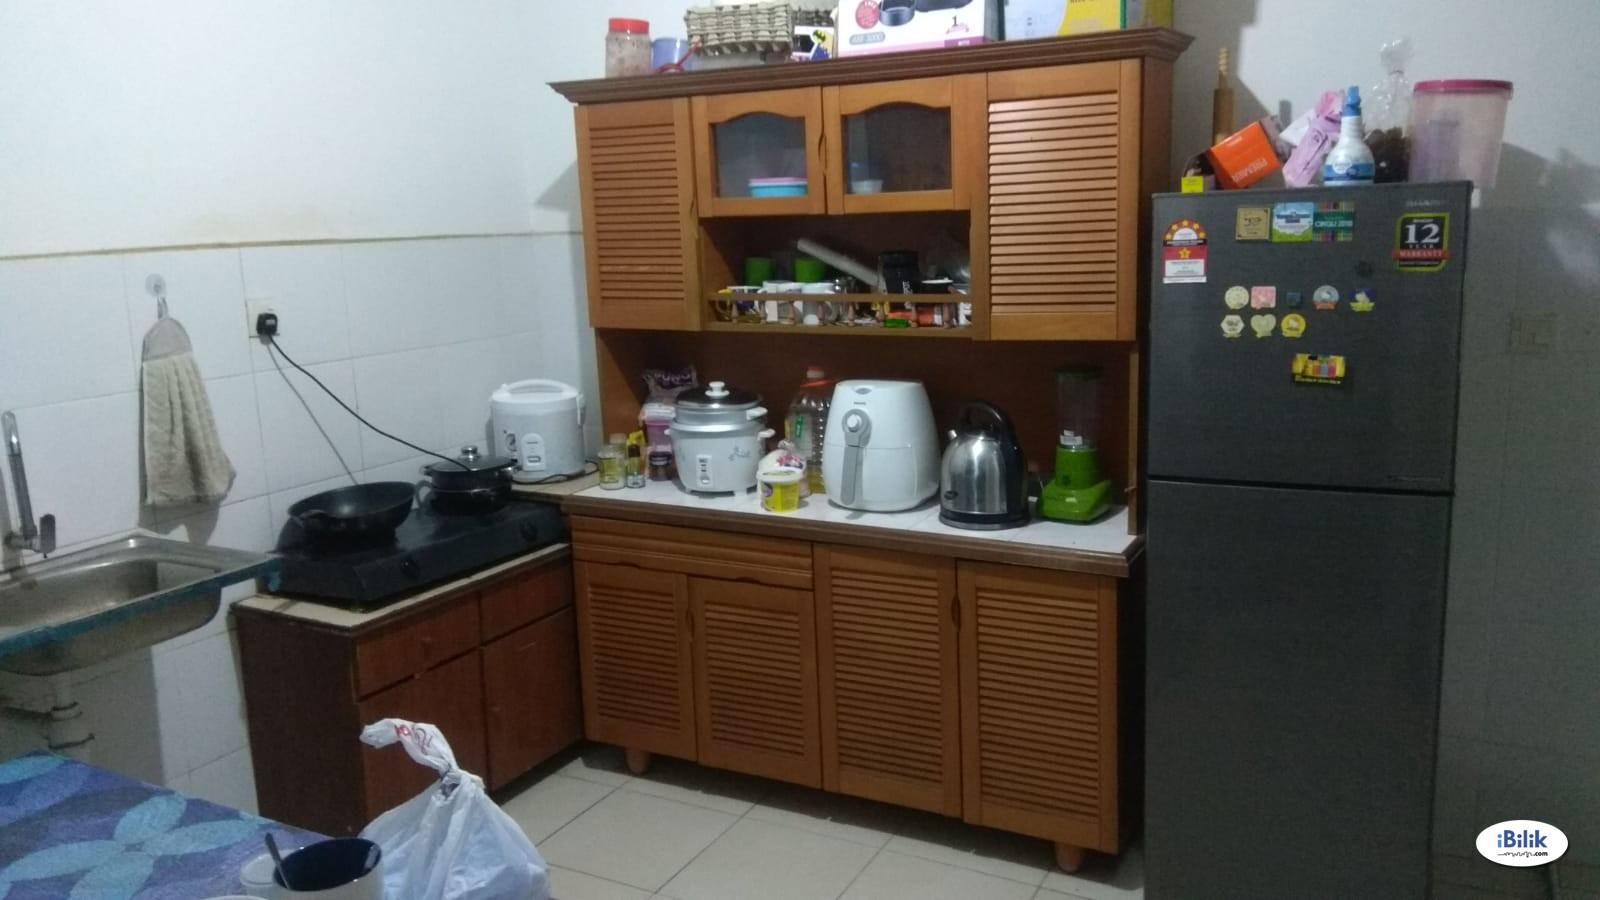 Single Room at Iskandar Puteri, Johor Bahru